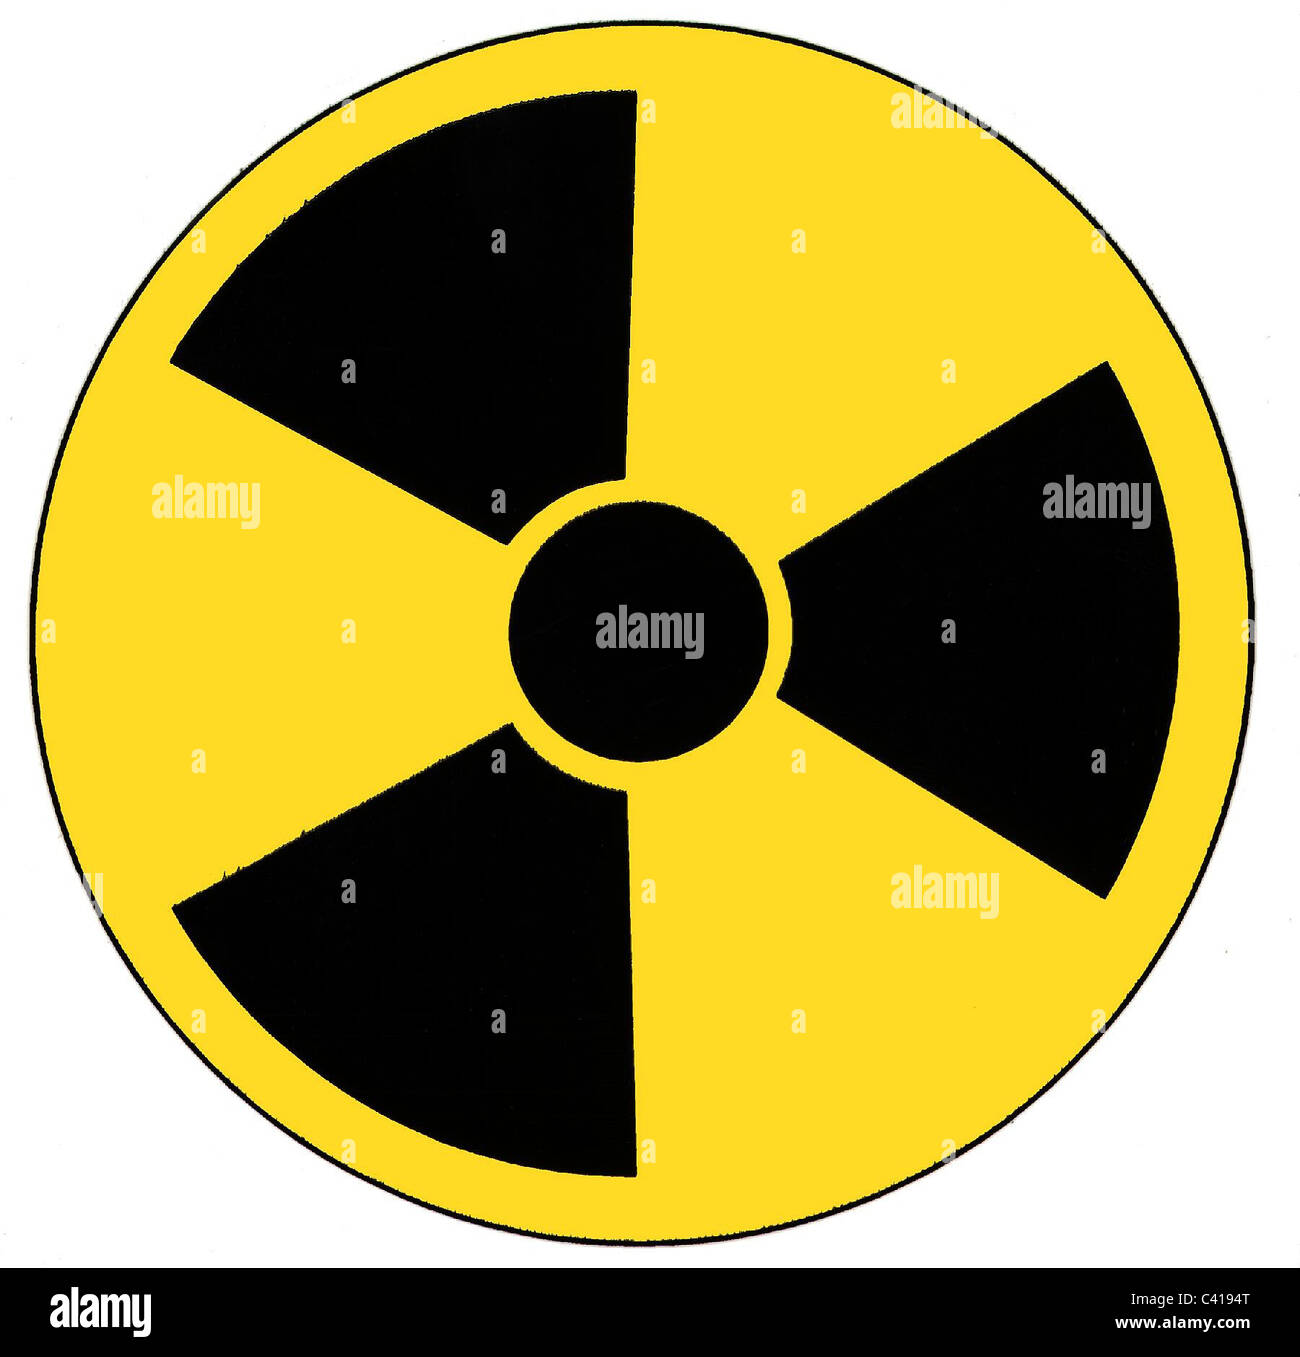 Symbol, Radioaktivität, Computergrafik, Additional-Rights - Clearences-NA Stockbild